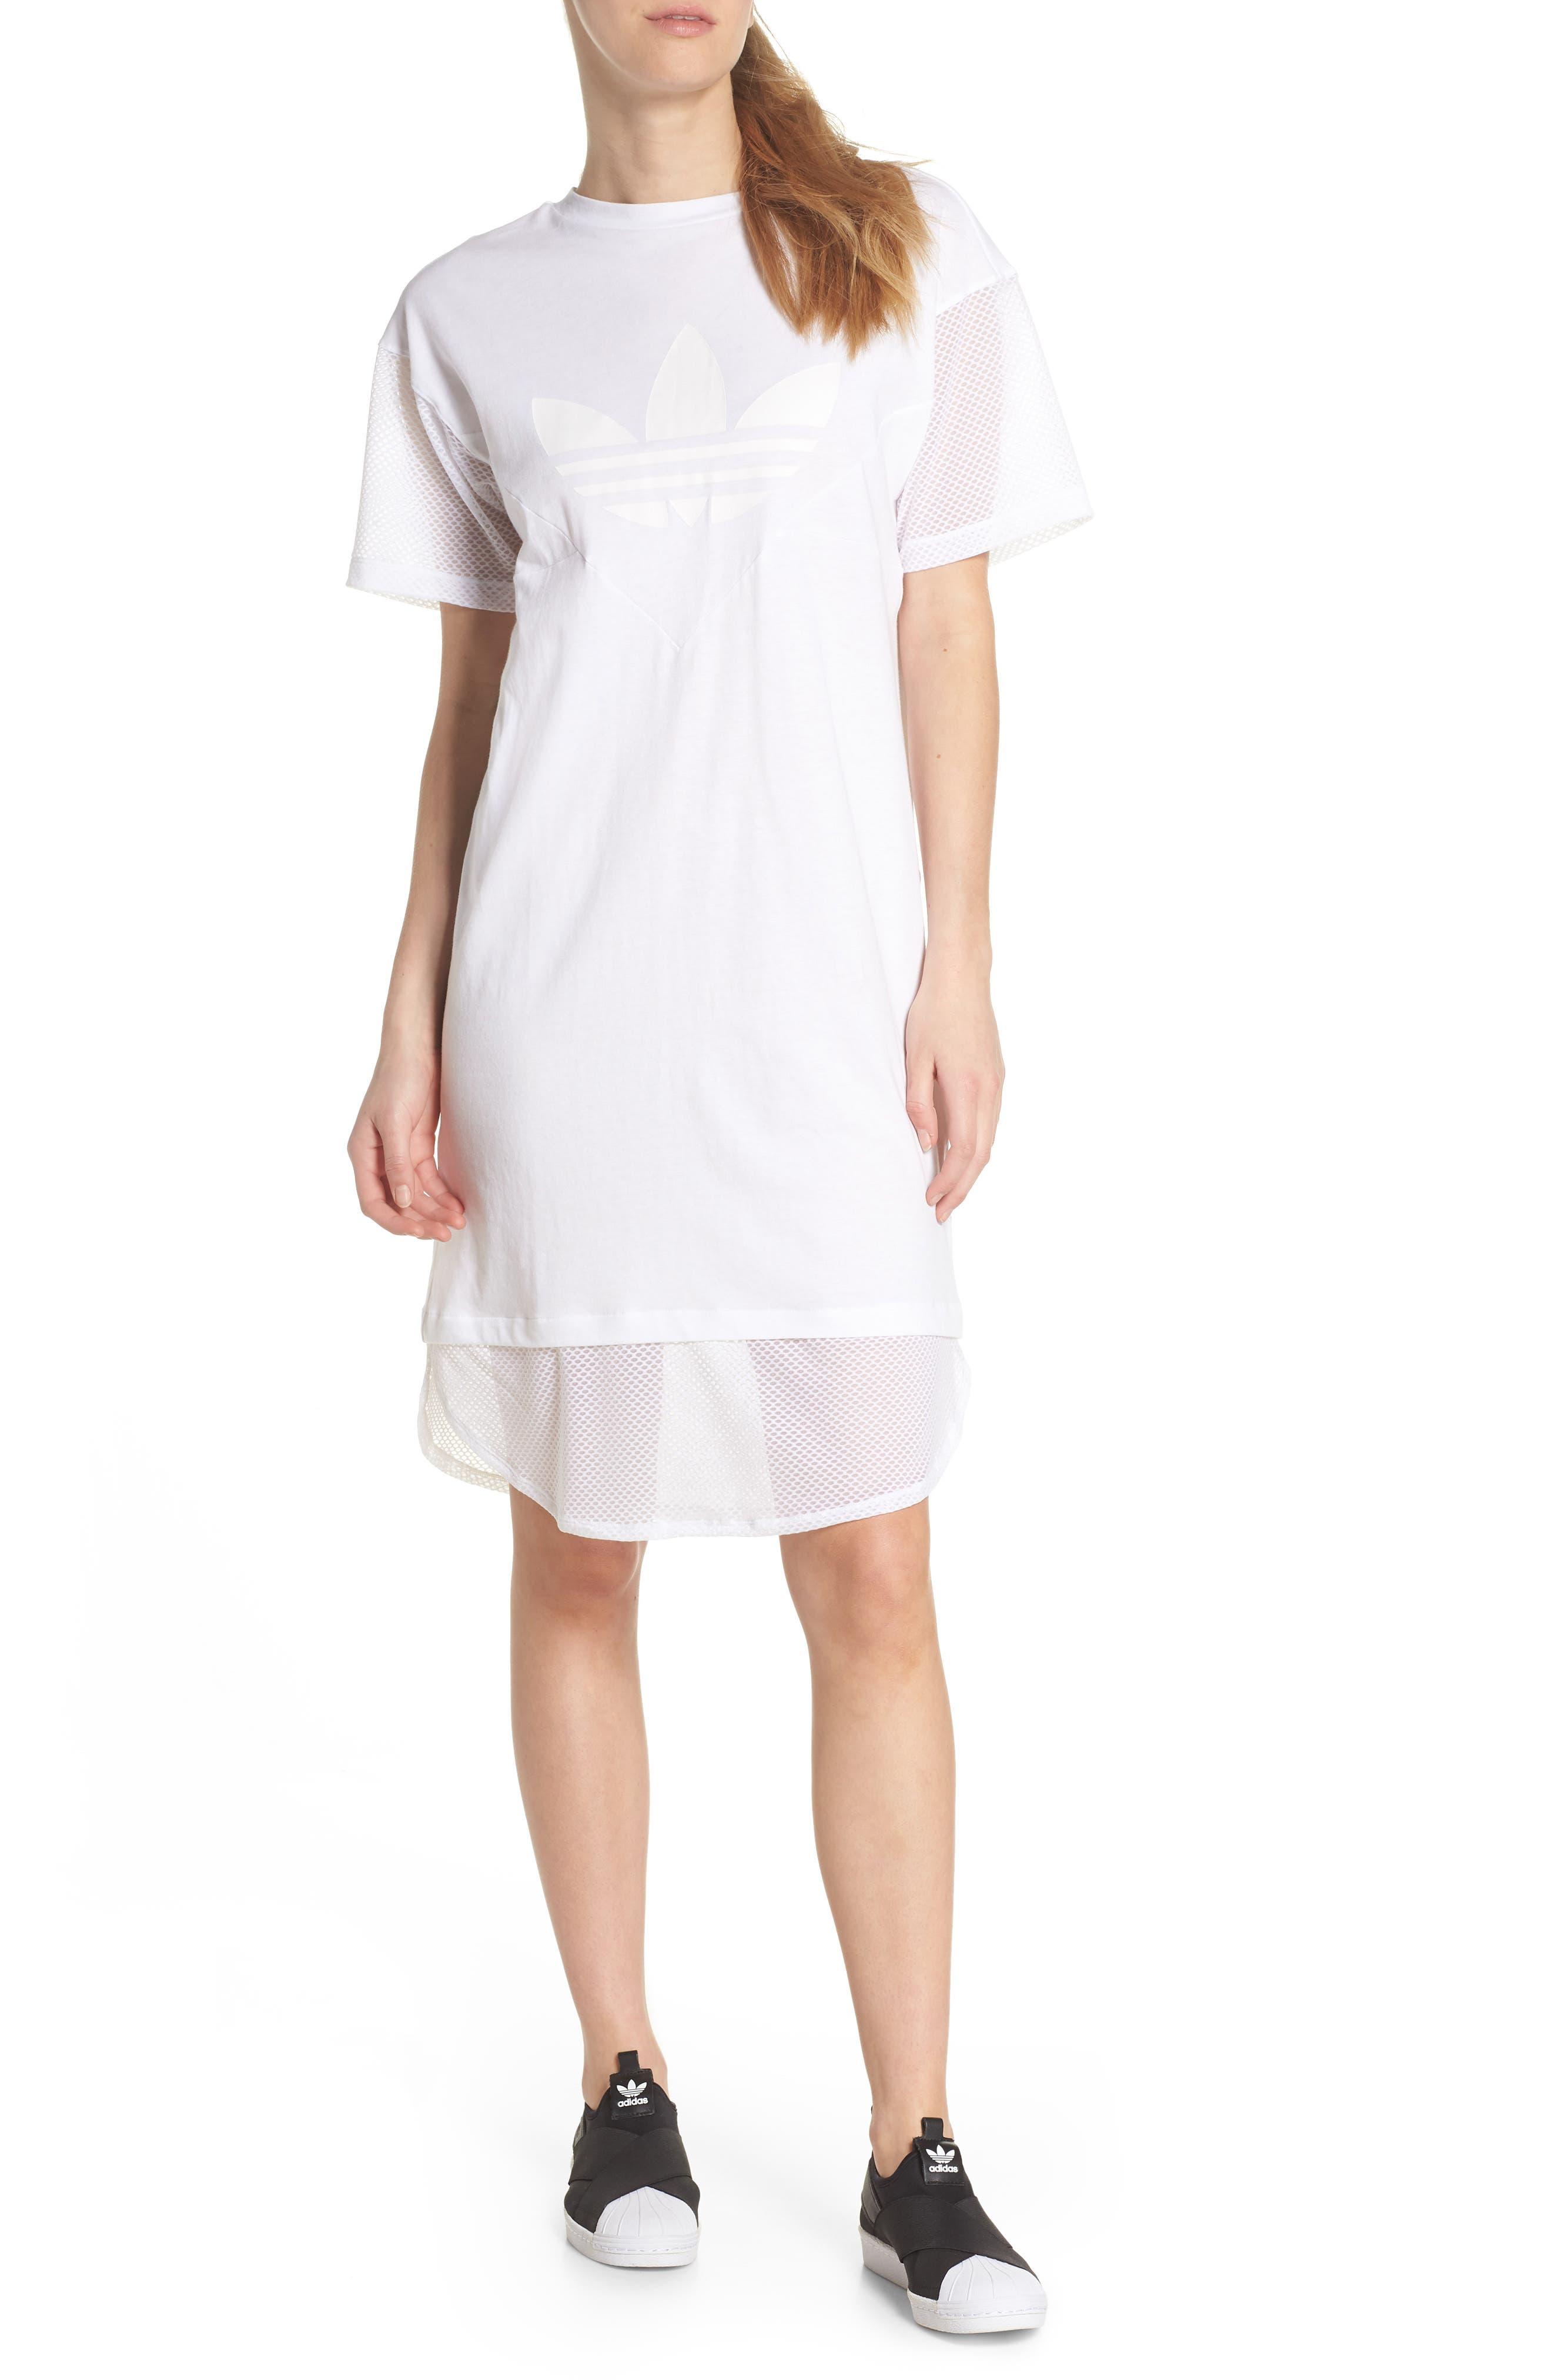 adidas CLRDO T-Shirt Dress